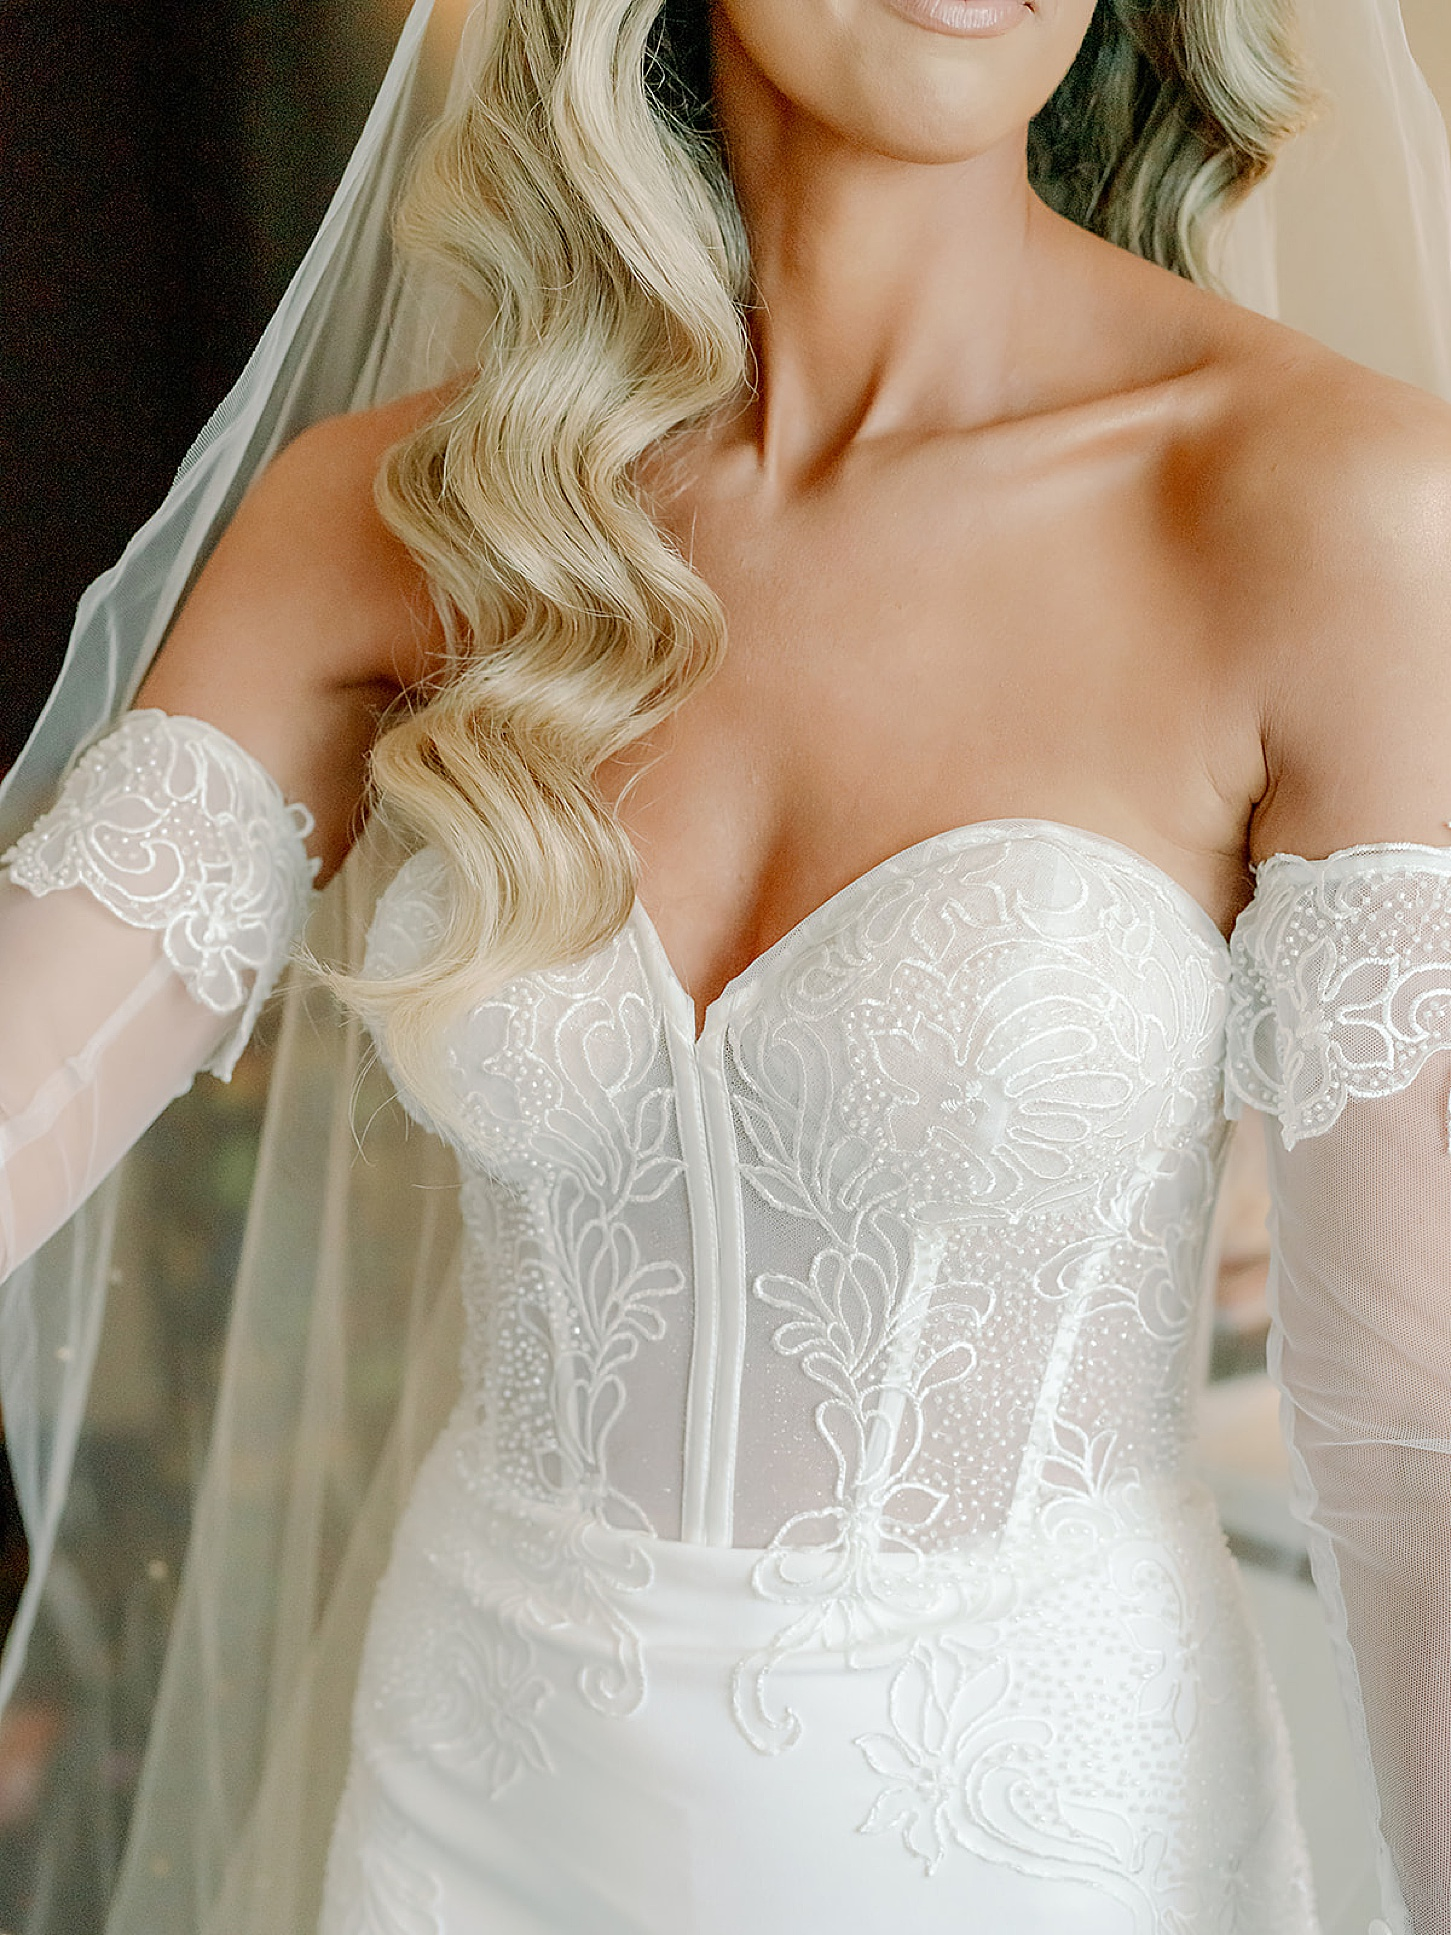 Atlantic City Wedding Photography Studio by Magdalena Studios Lexy Cha 0012